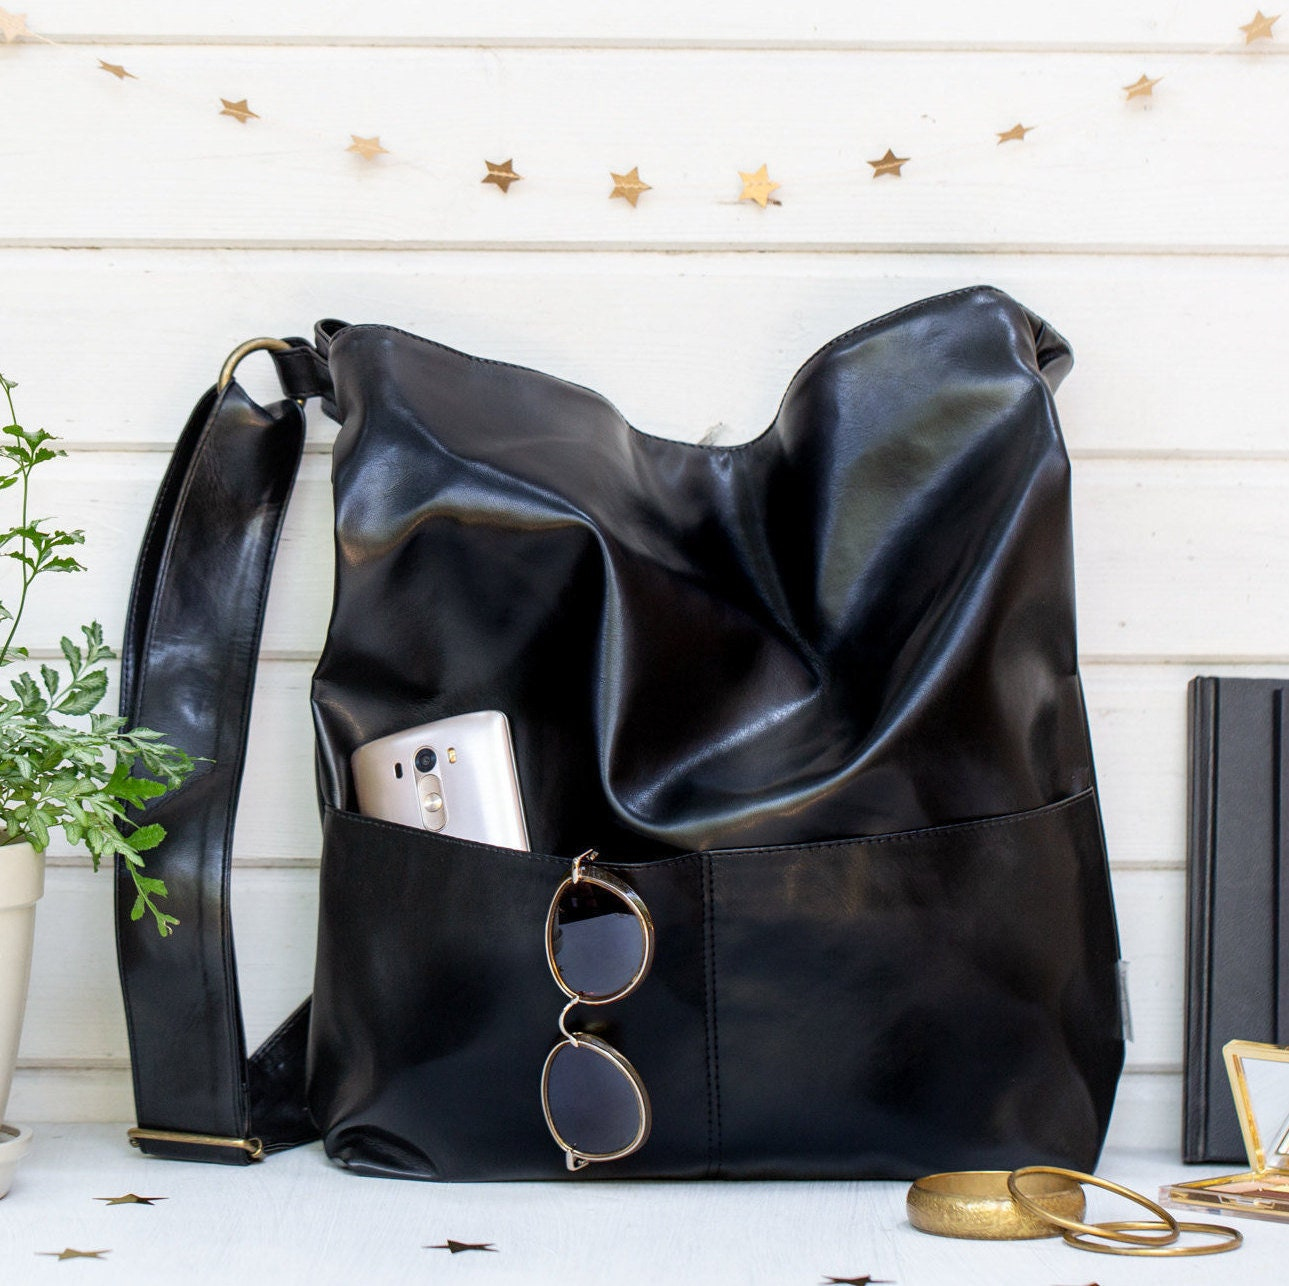 861b1cefc6 Black Hobo Bag Women Shoulder Bags Vegan Handbags Crossbody